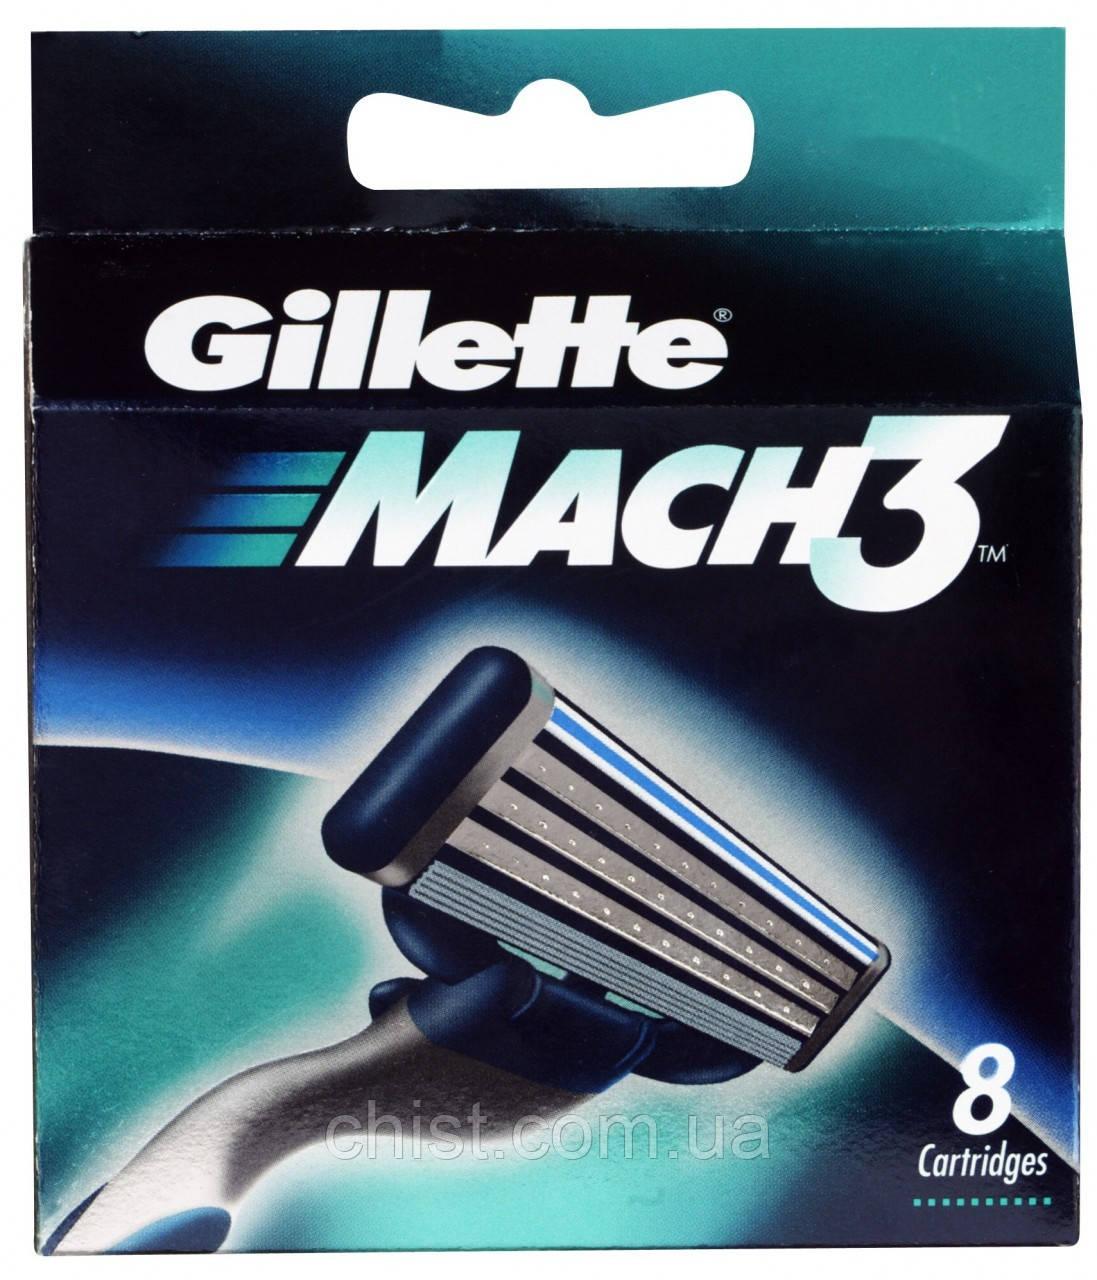 Gillette Mach3 сменные картриджи (8 шт)